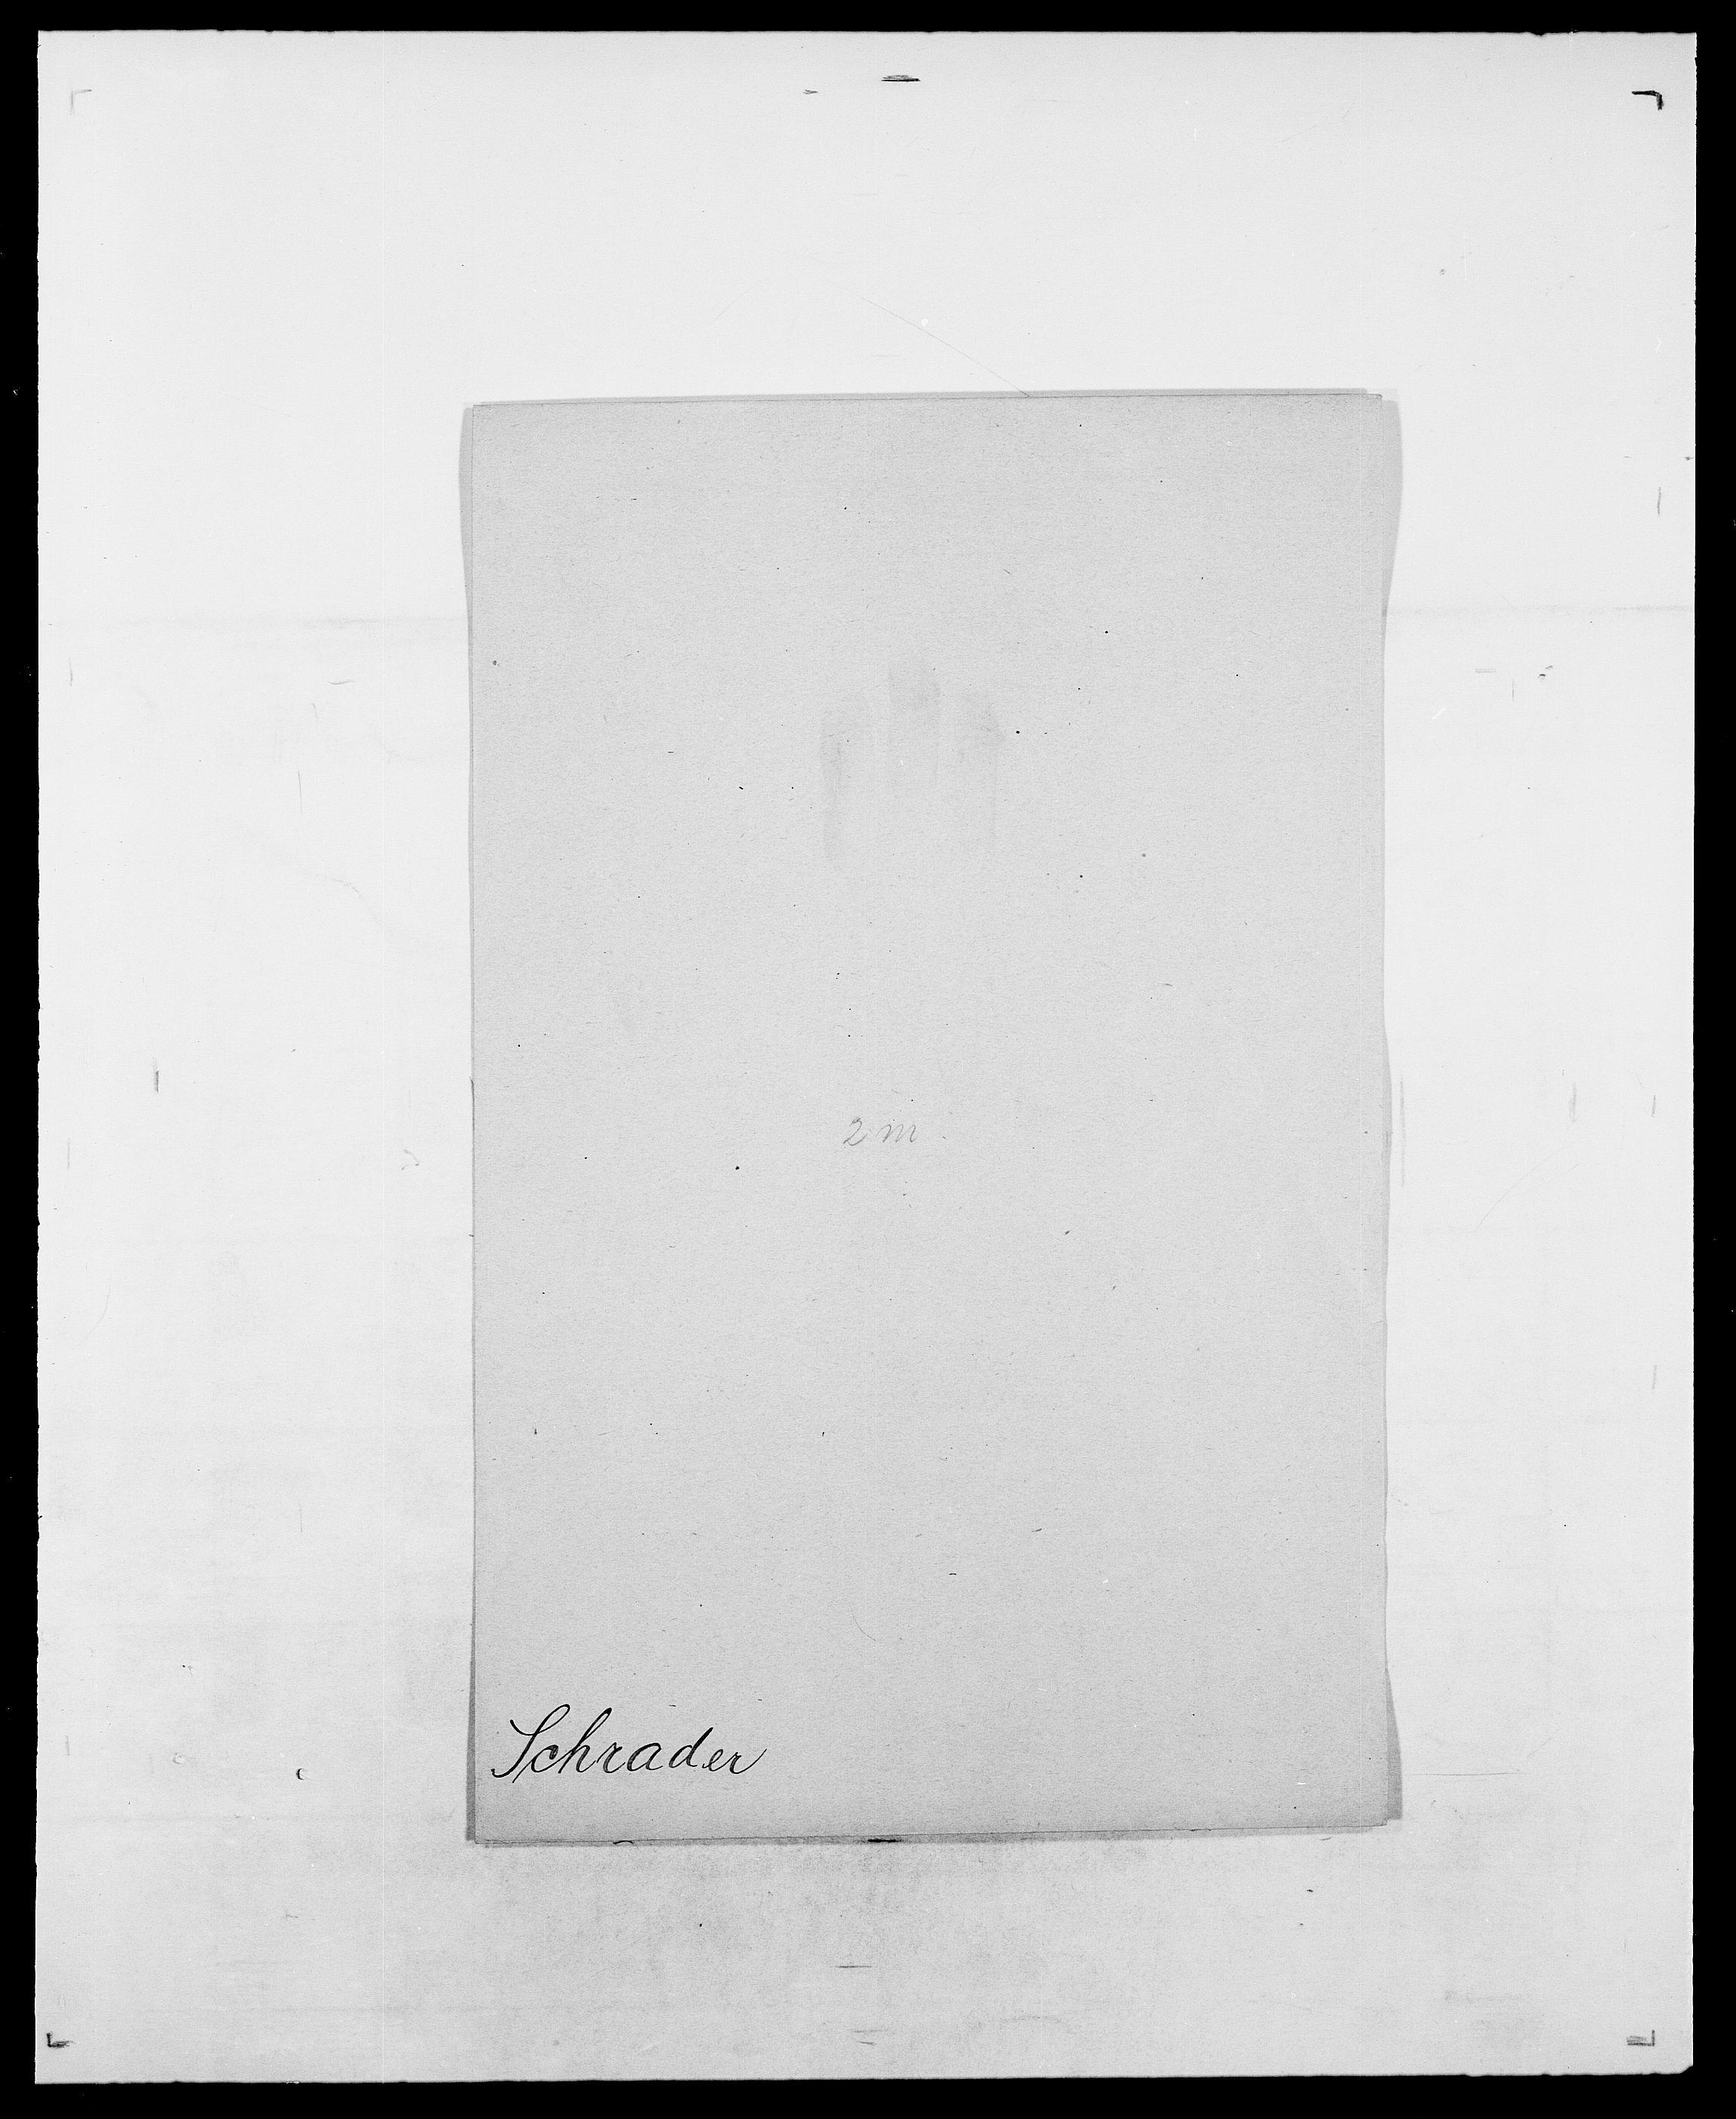 SAO, Delgobe, Charles Antoine - samling, D/Da/L0035: Schnabel - sjetman, s. 116